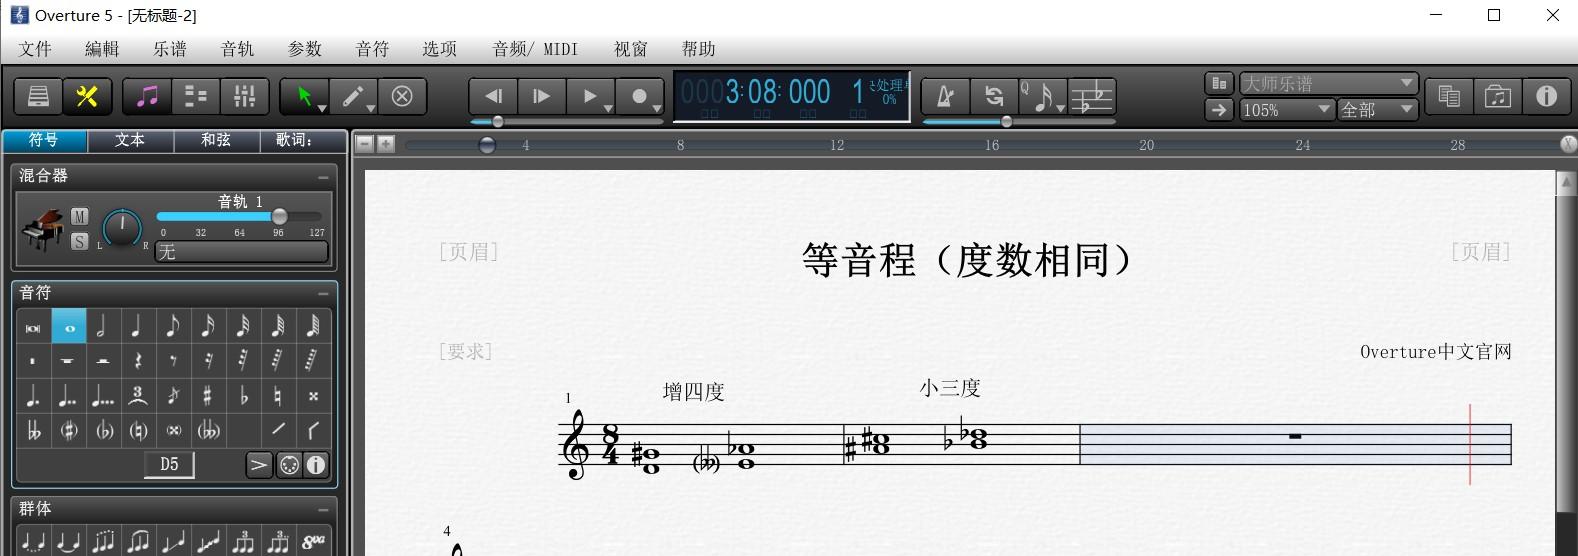 Overture五线谱中度数相同的等音程